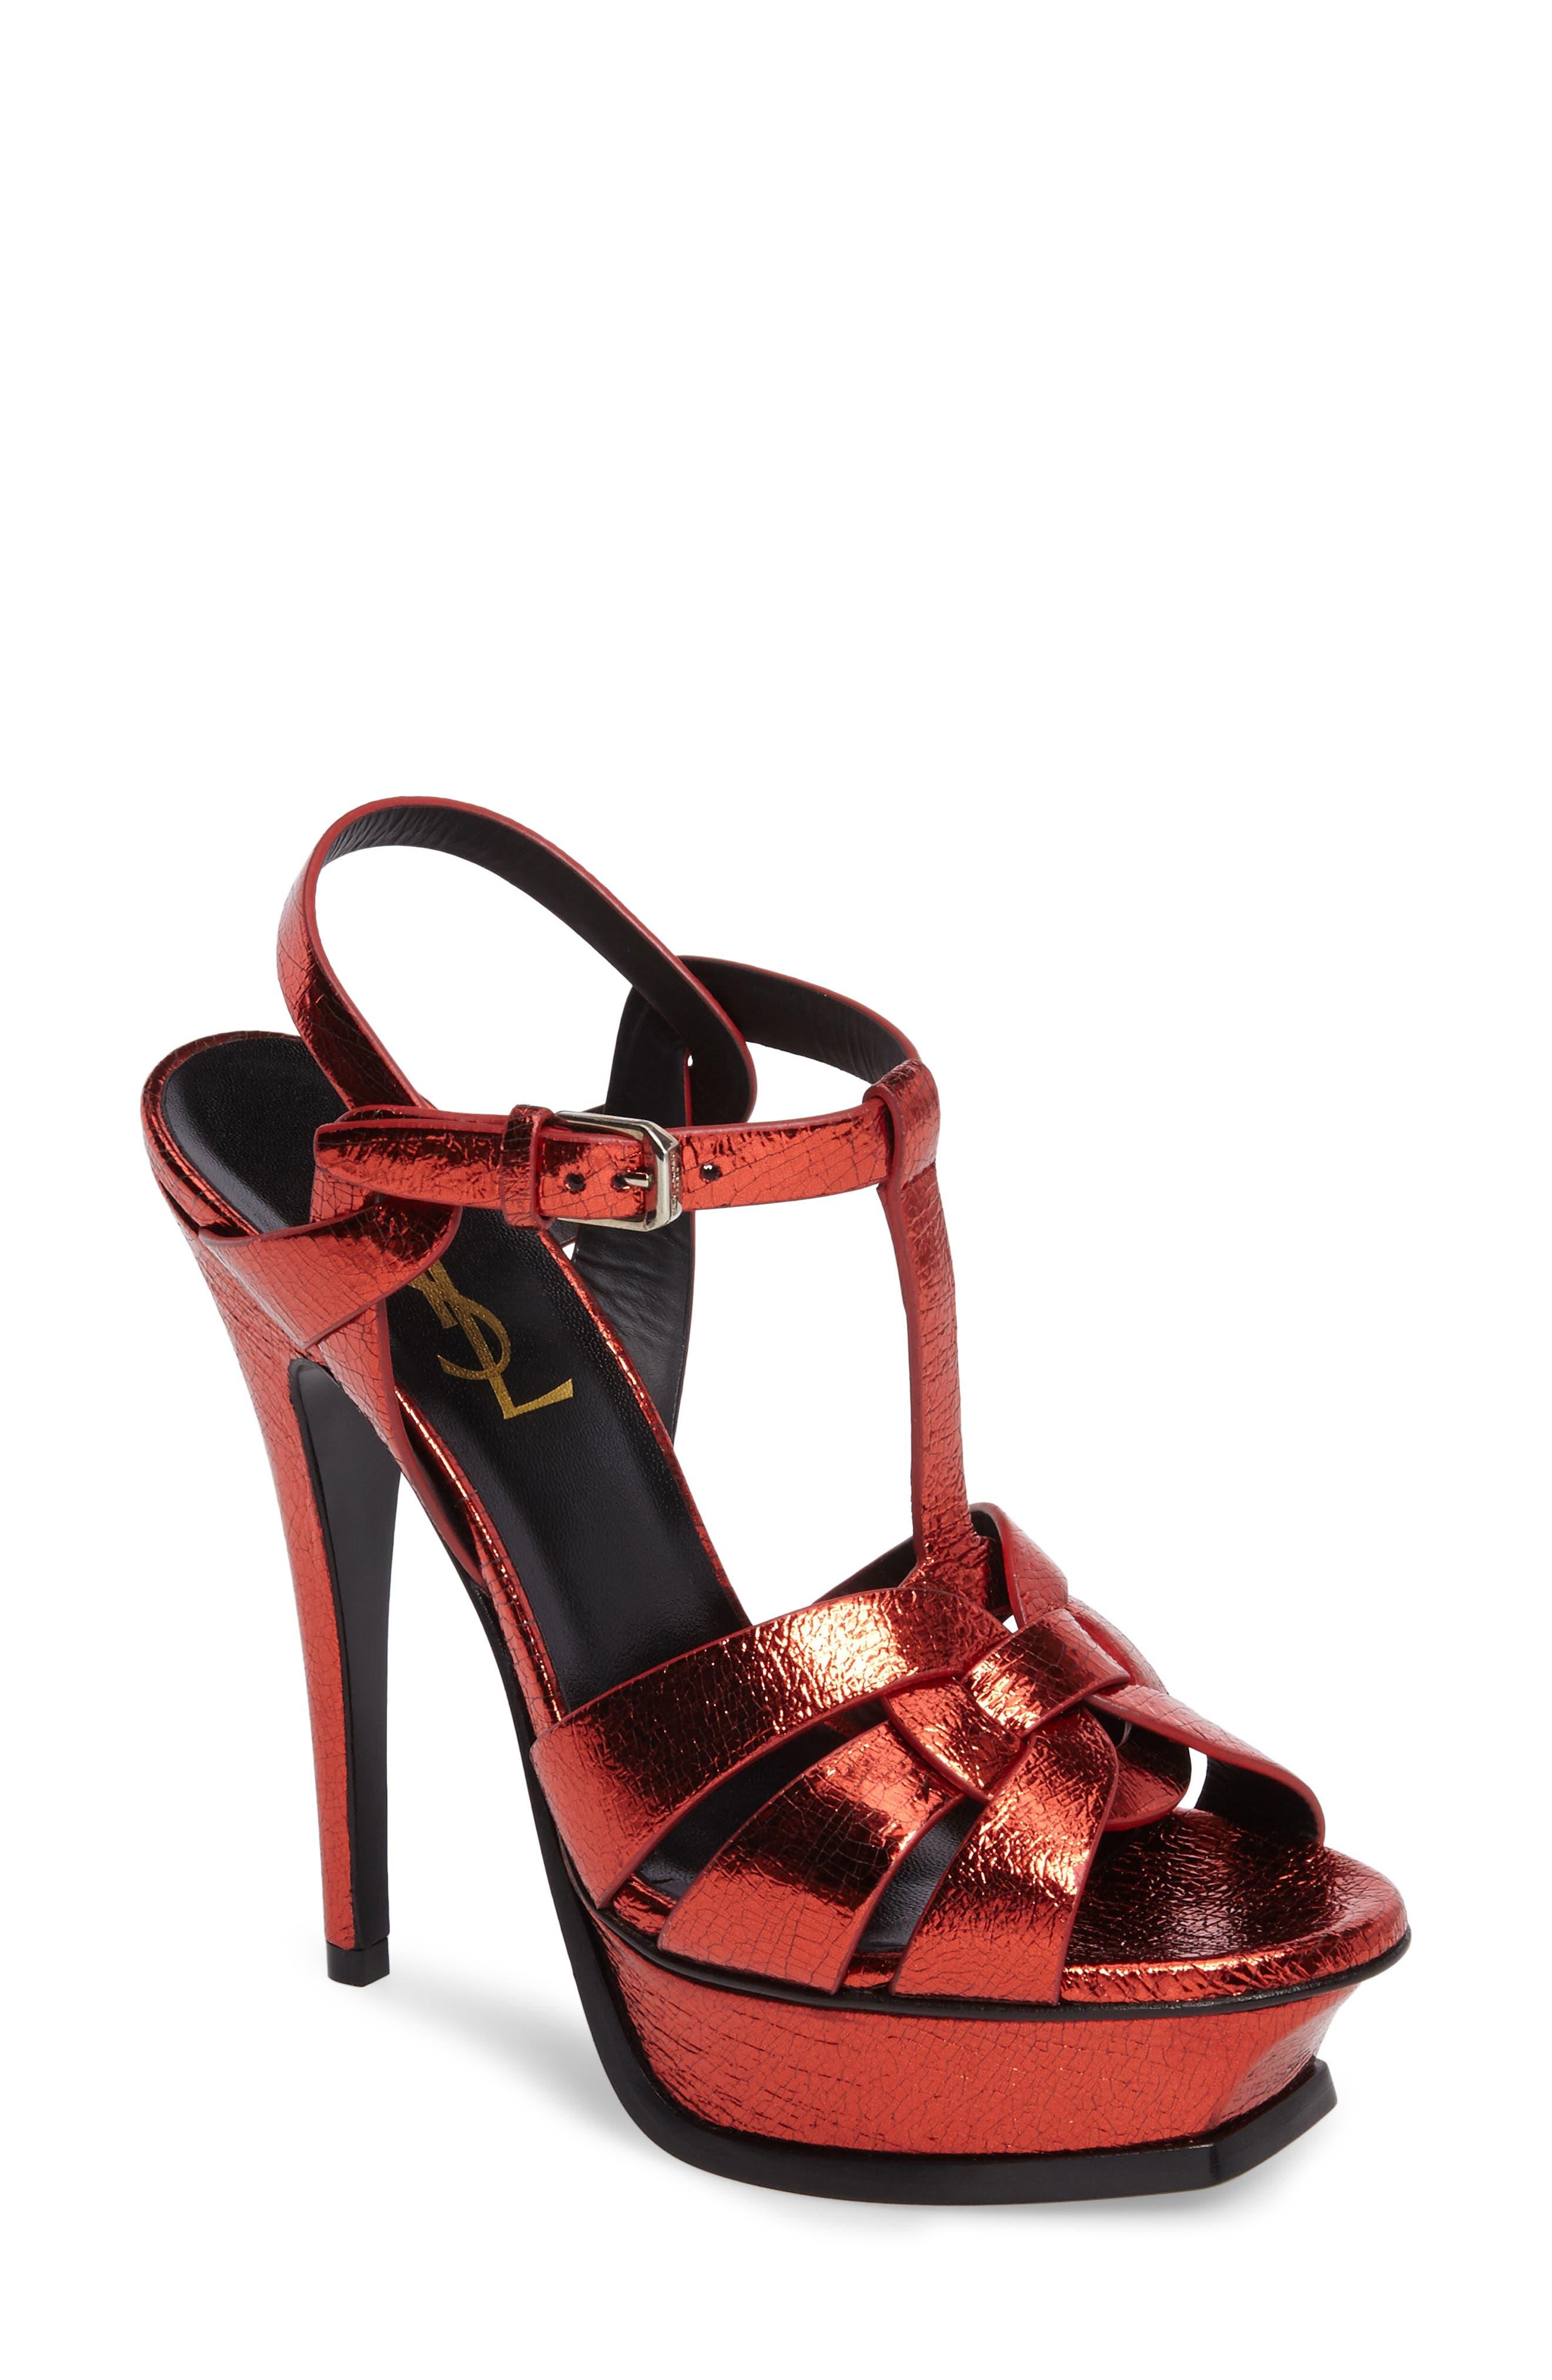 Alternate Image 1 Selected - Saint Laurent Tribute Metallic Platform Sandal (Women)